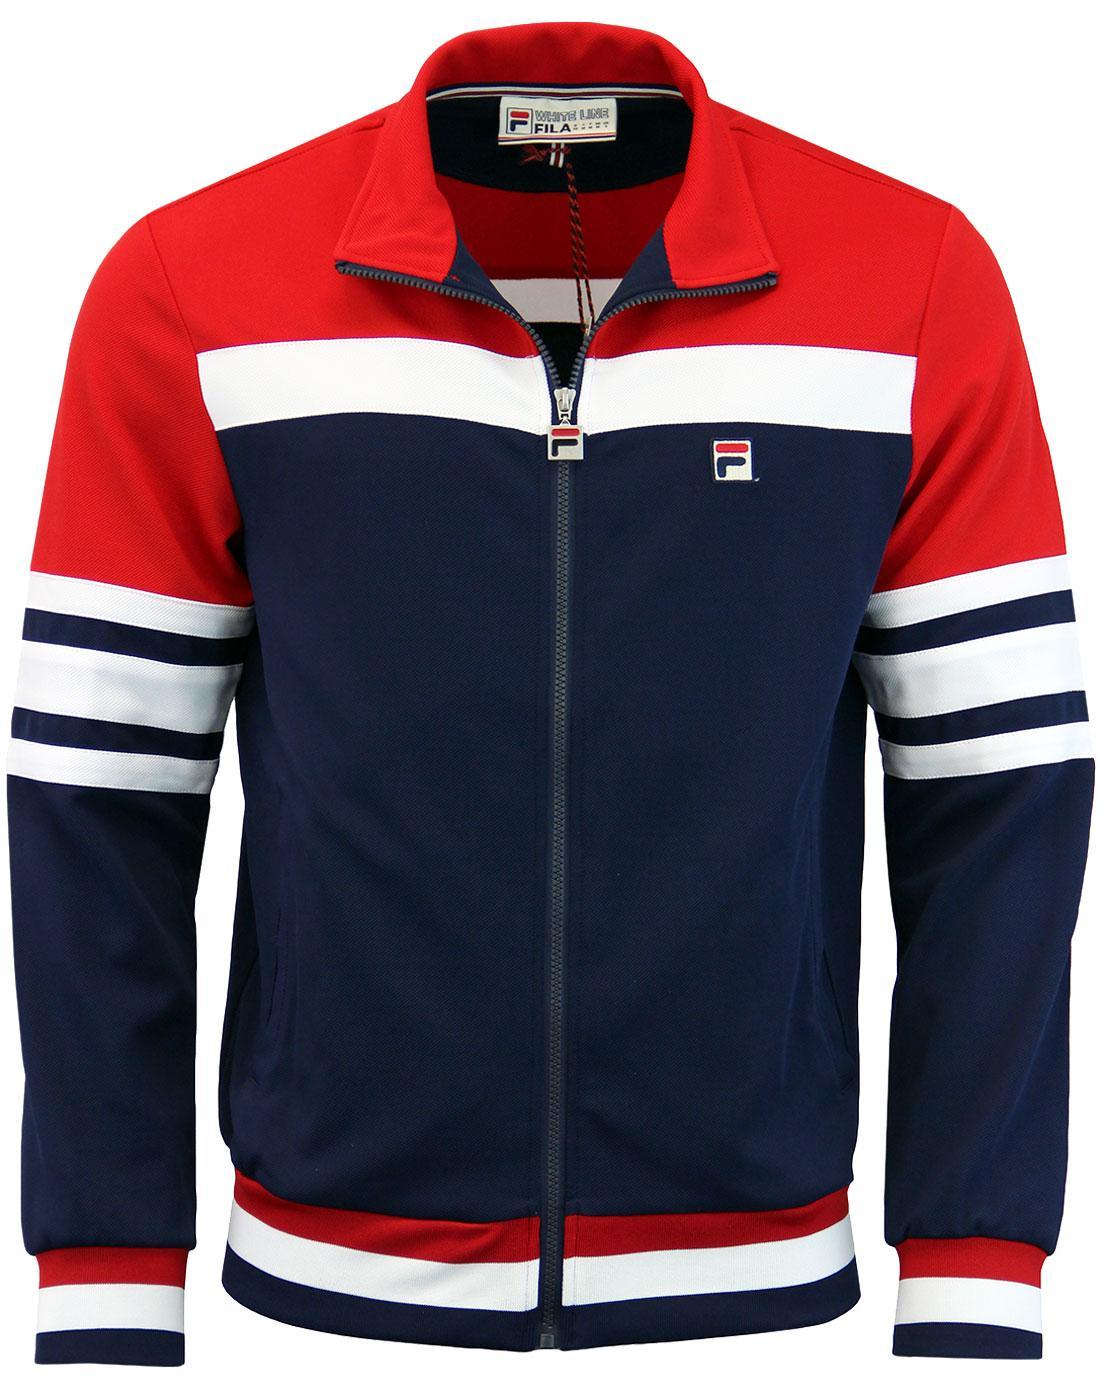 Courto FILA VINTAGE Retro 80s Stripe Track Jacket